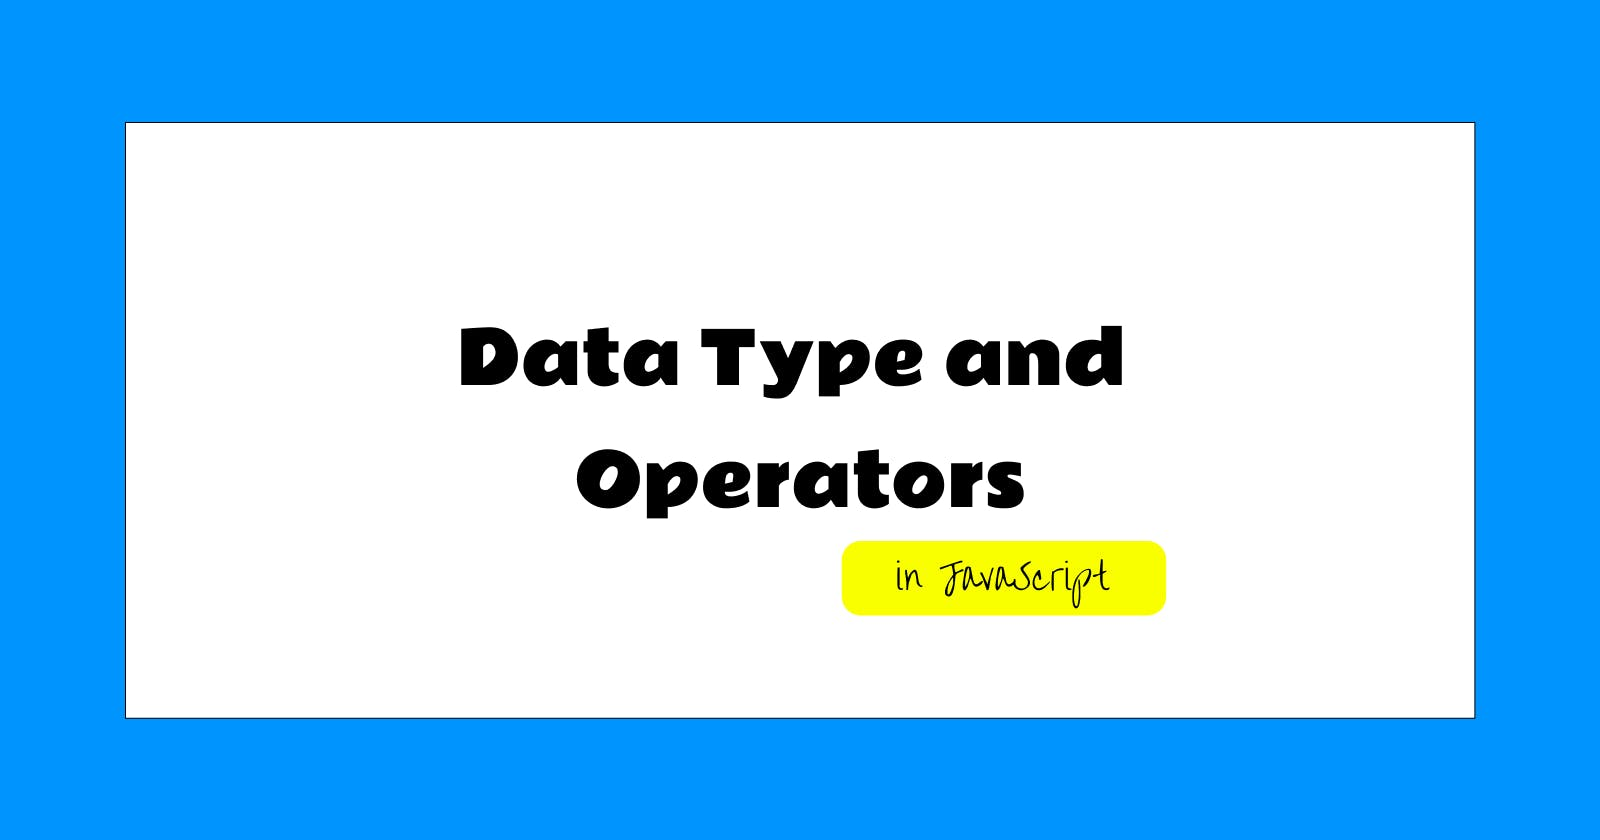 Data Type and Operators in JavaScript